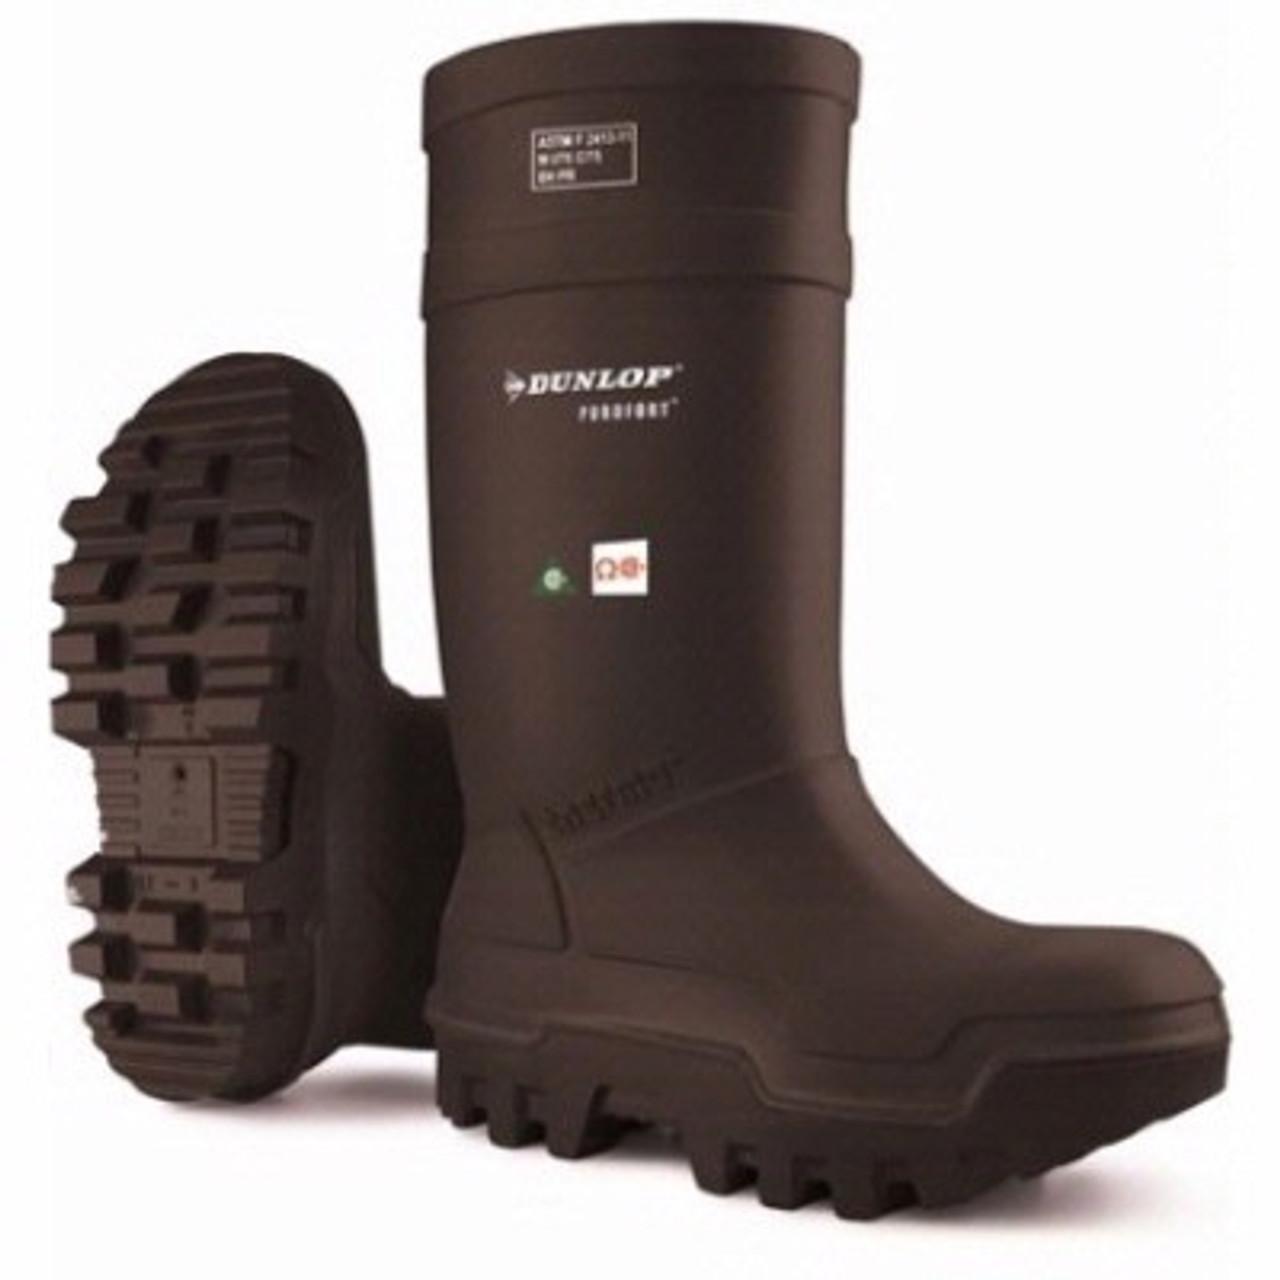 Sizes 5-13 Dunlop Purofort Thermo Plus Safety Wellington Work Boots Orange